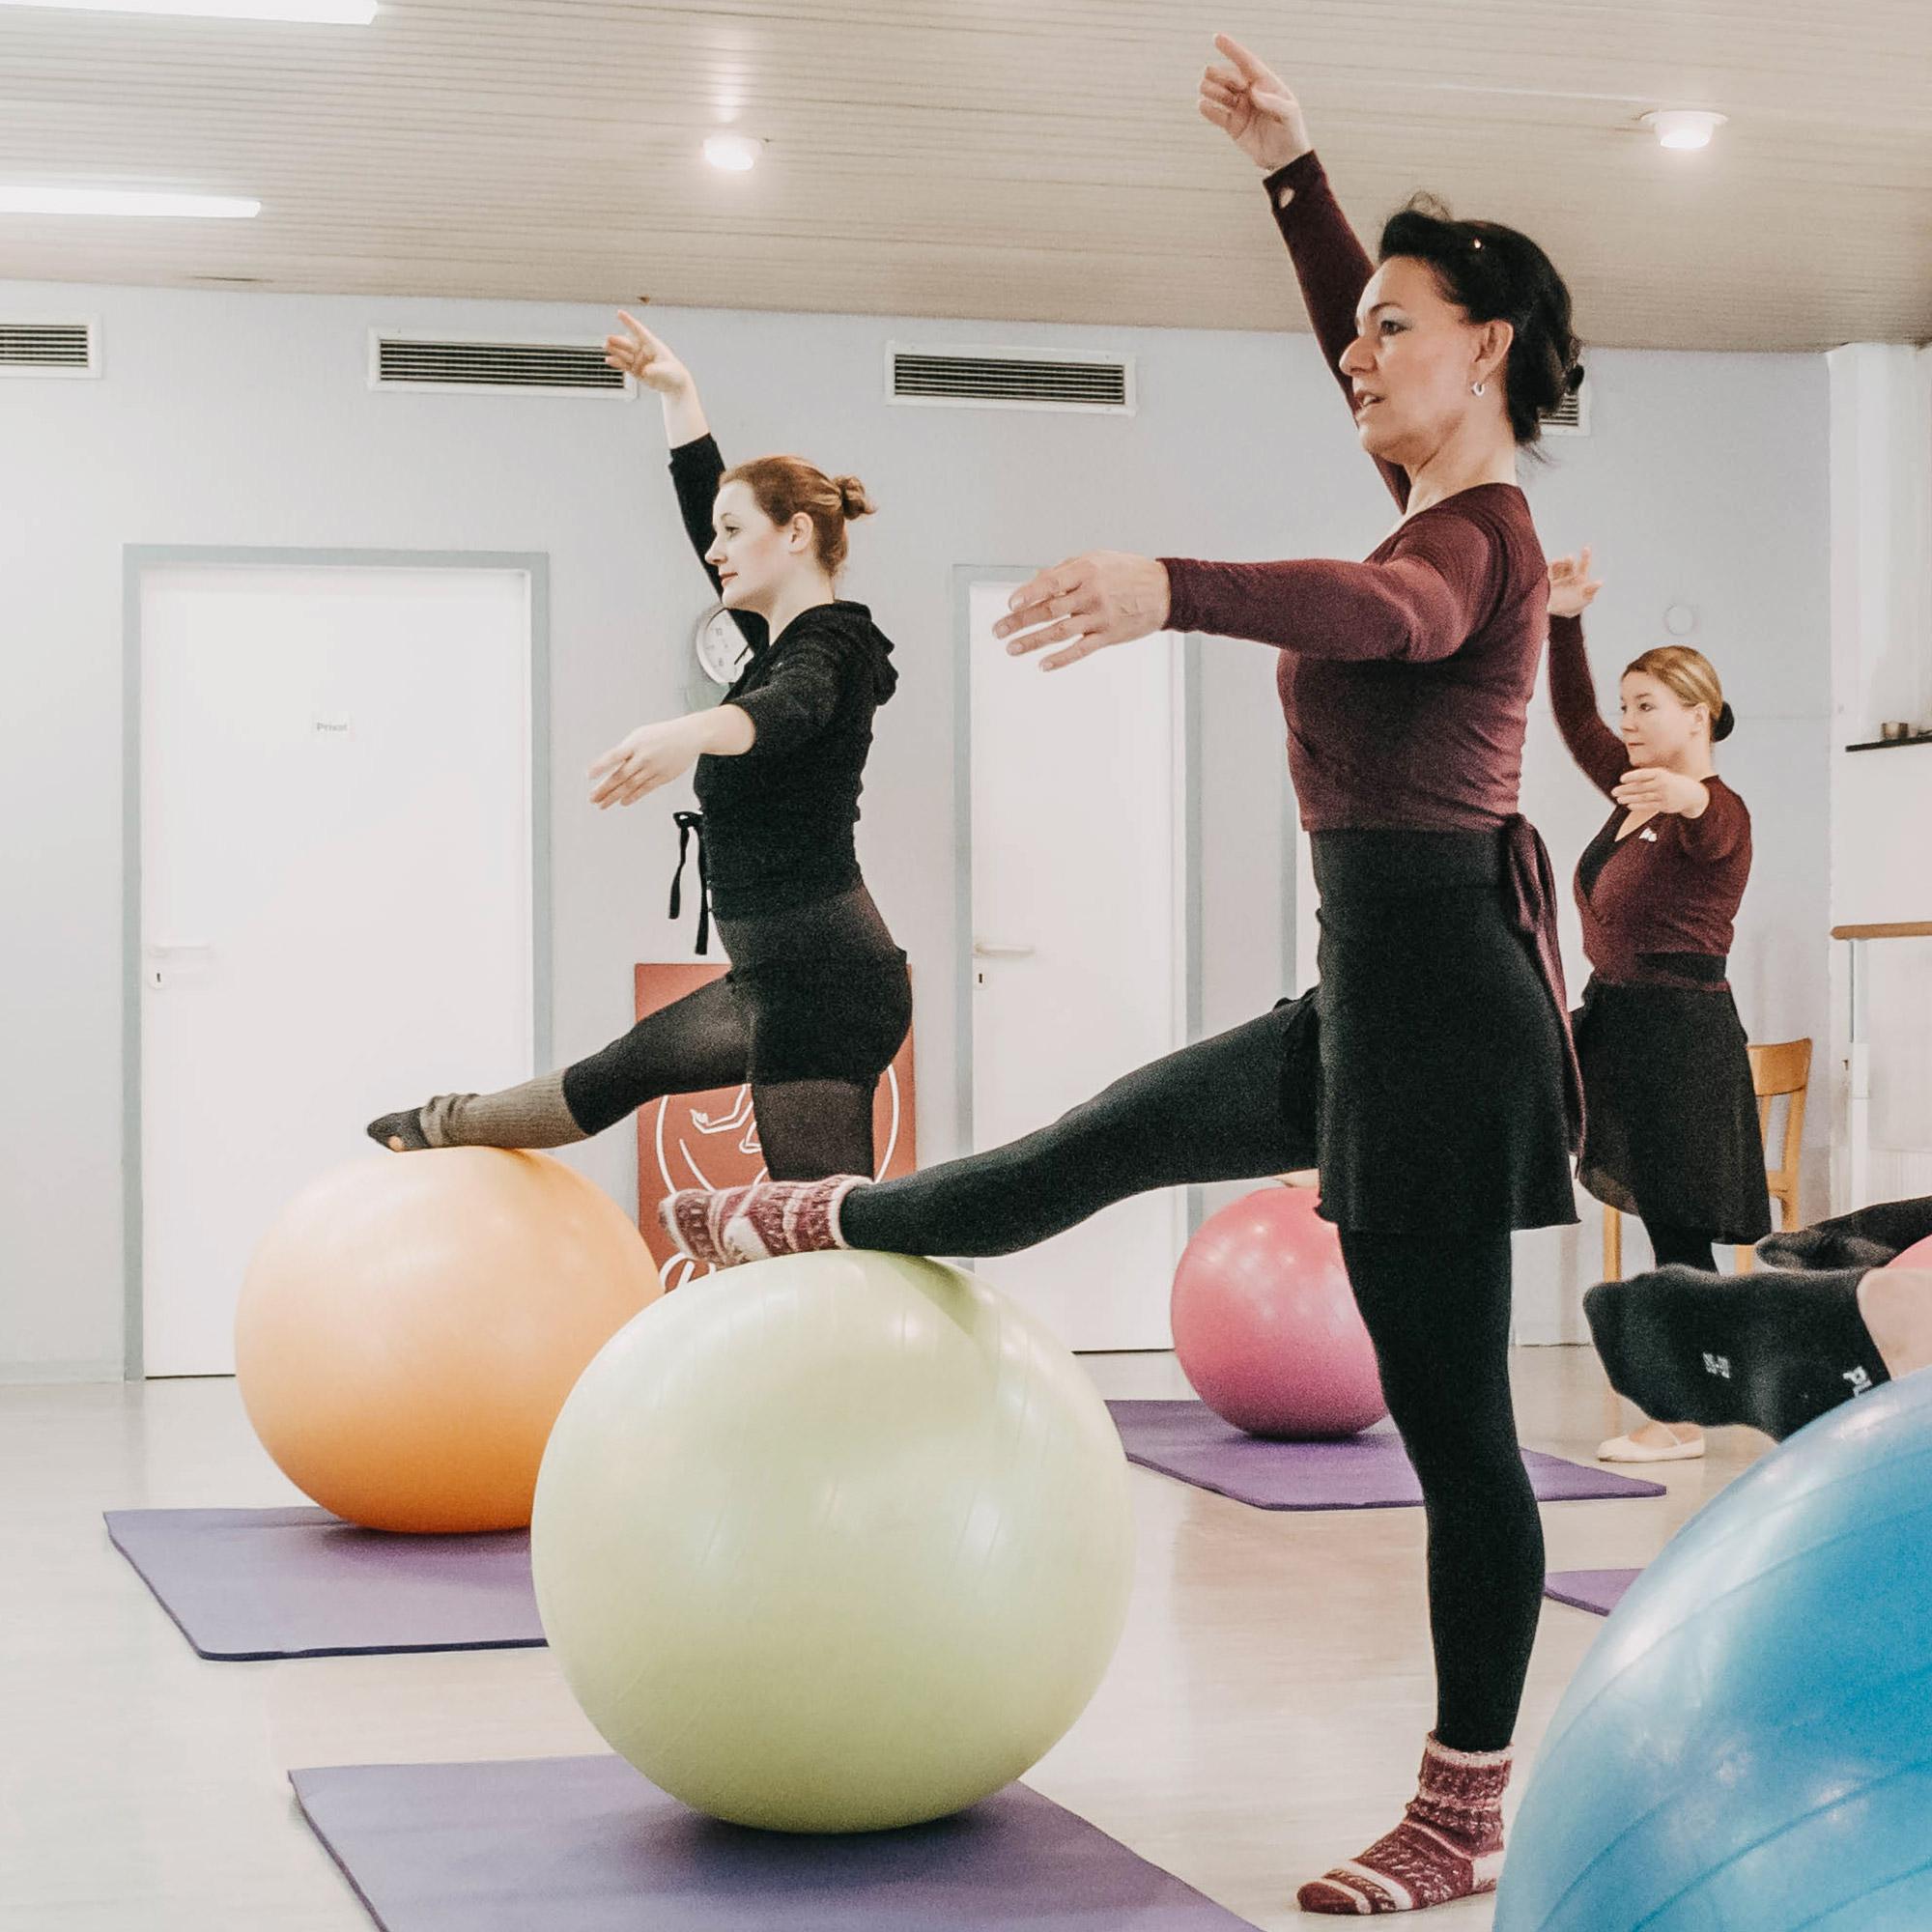 Ballerita_Ballett_Jazz_Tanz_Training_Mülheim_Duisburg_PBT-3